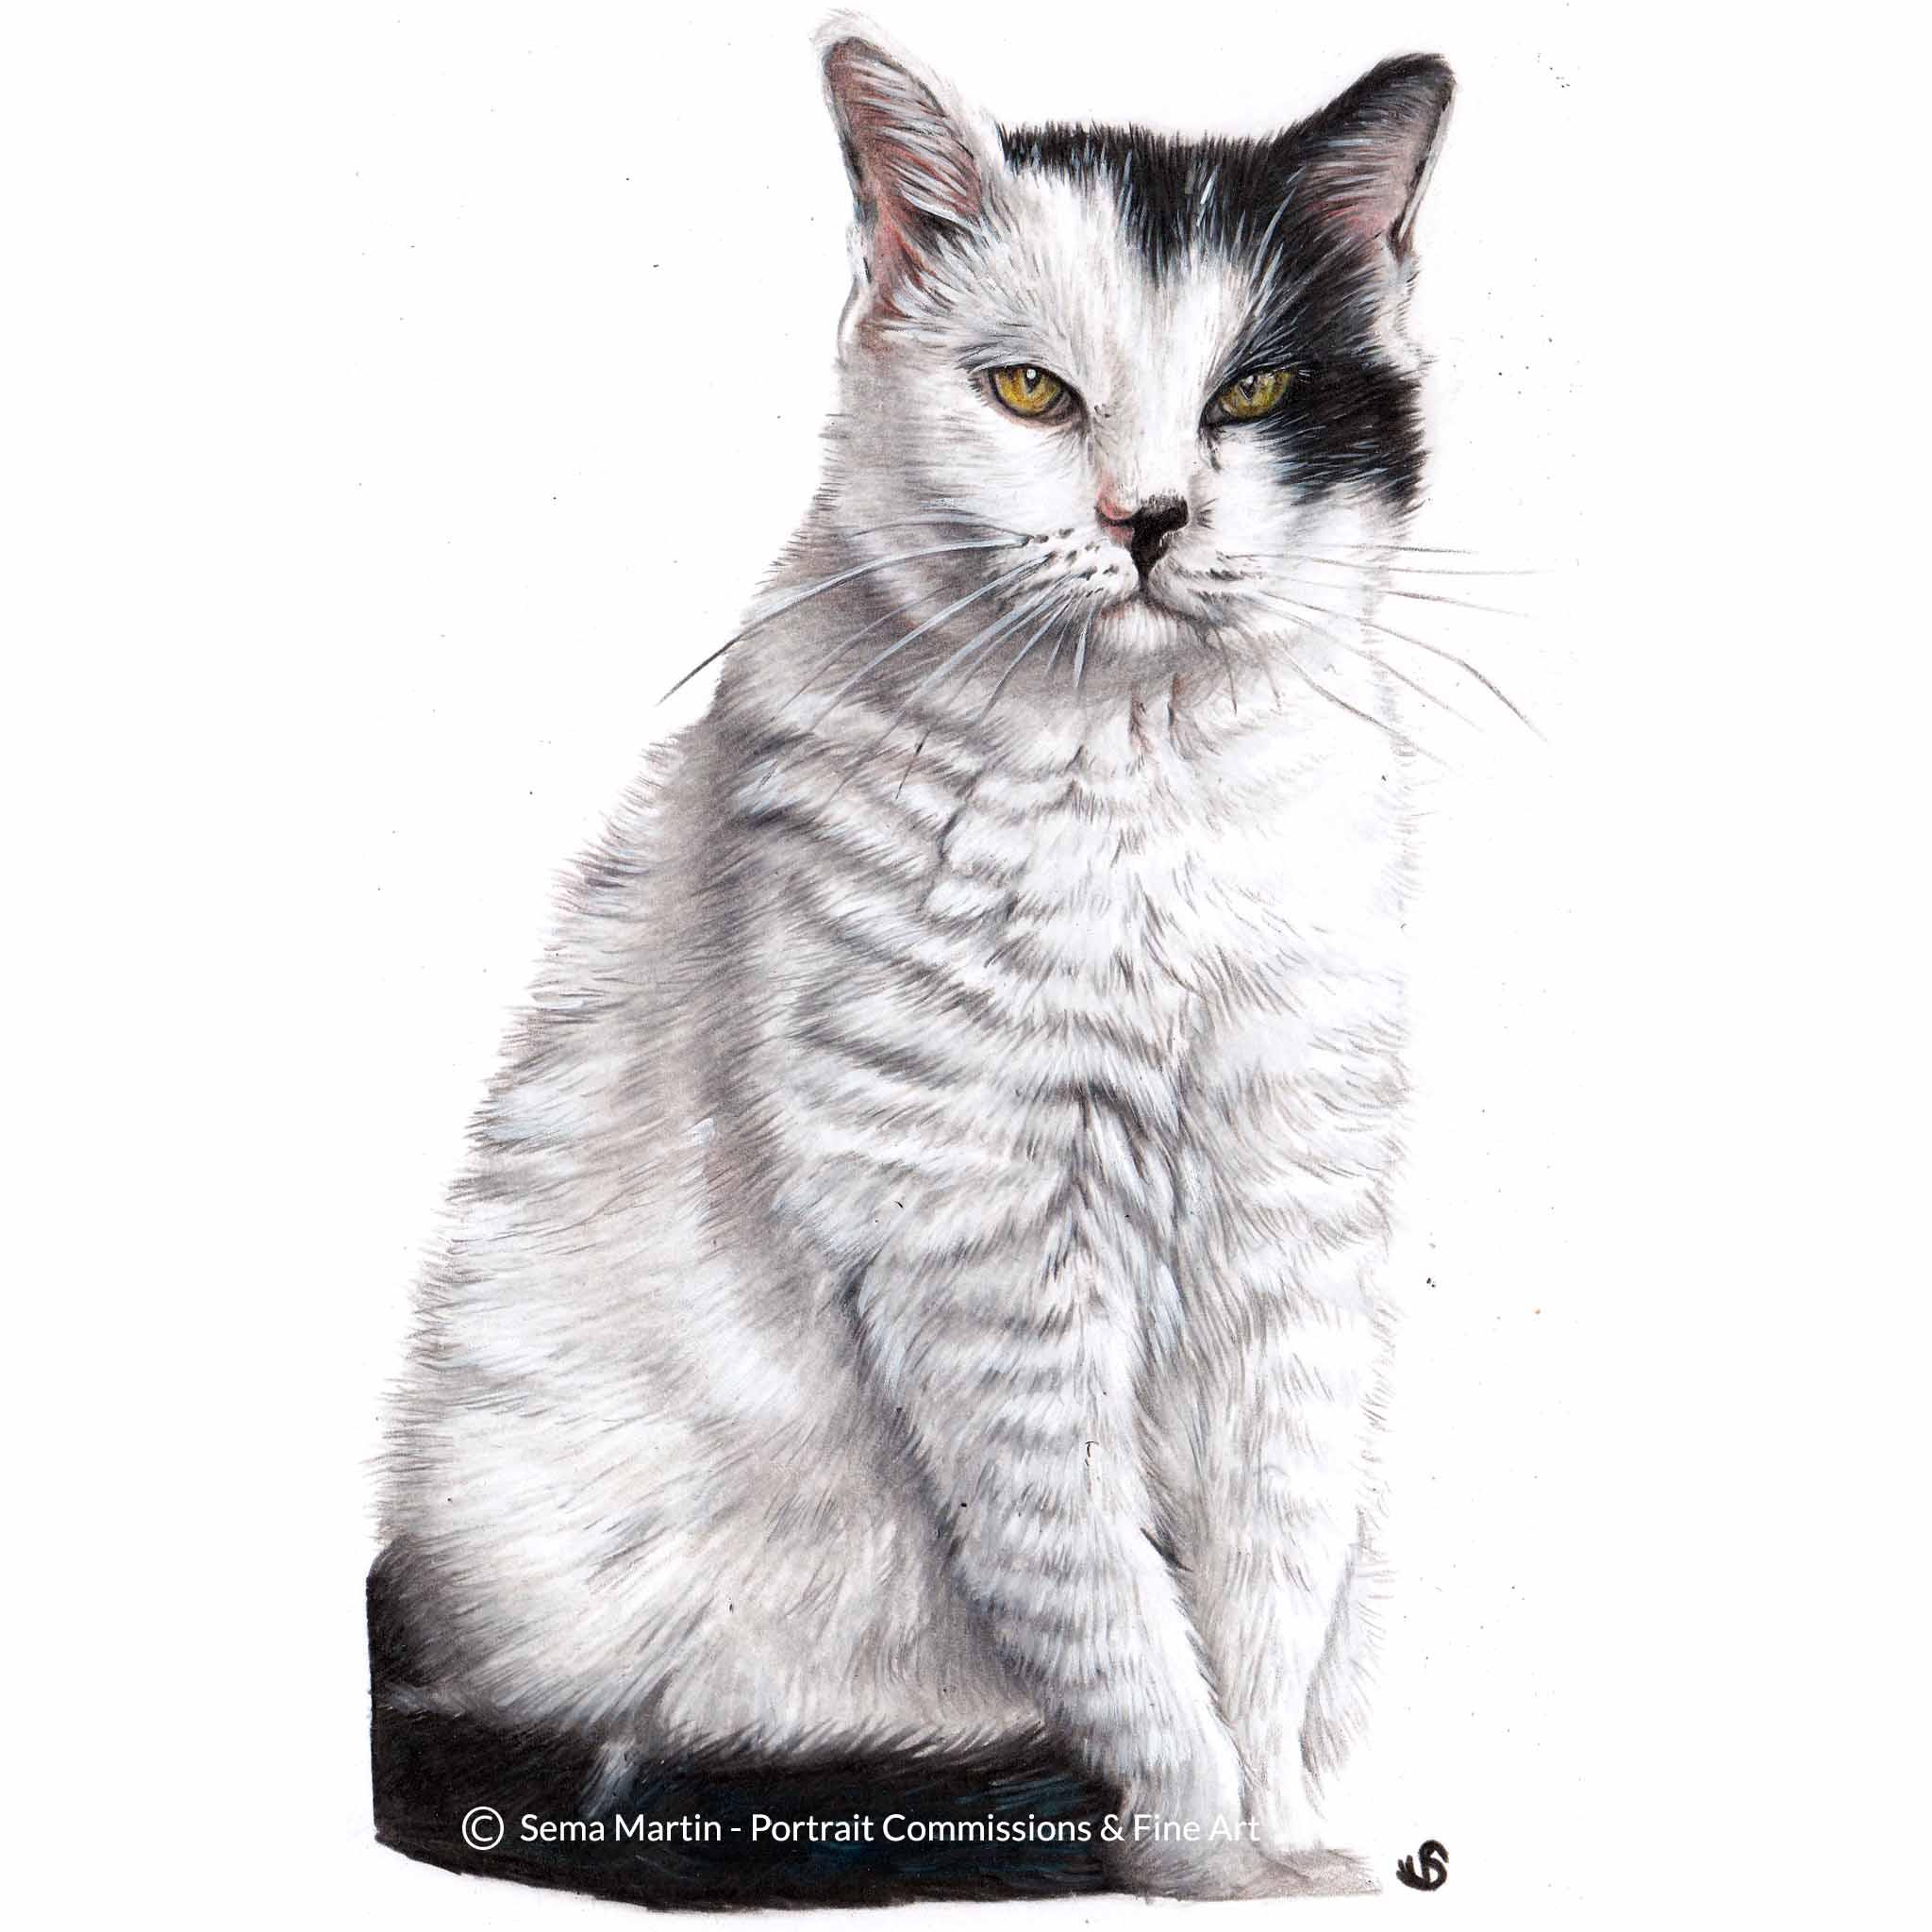 'General Wedge Antilles', USA, 5.8 x 8.3 inches, 2018, Colour Pencil Cat Portrait by Sema Martin